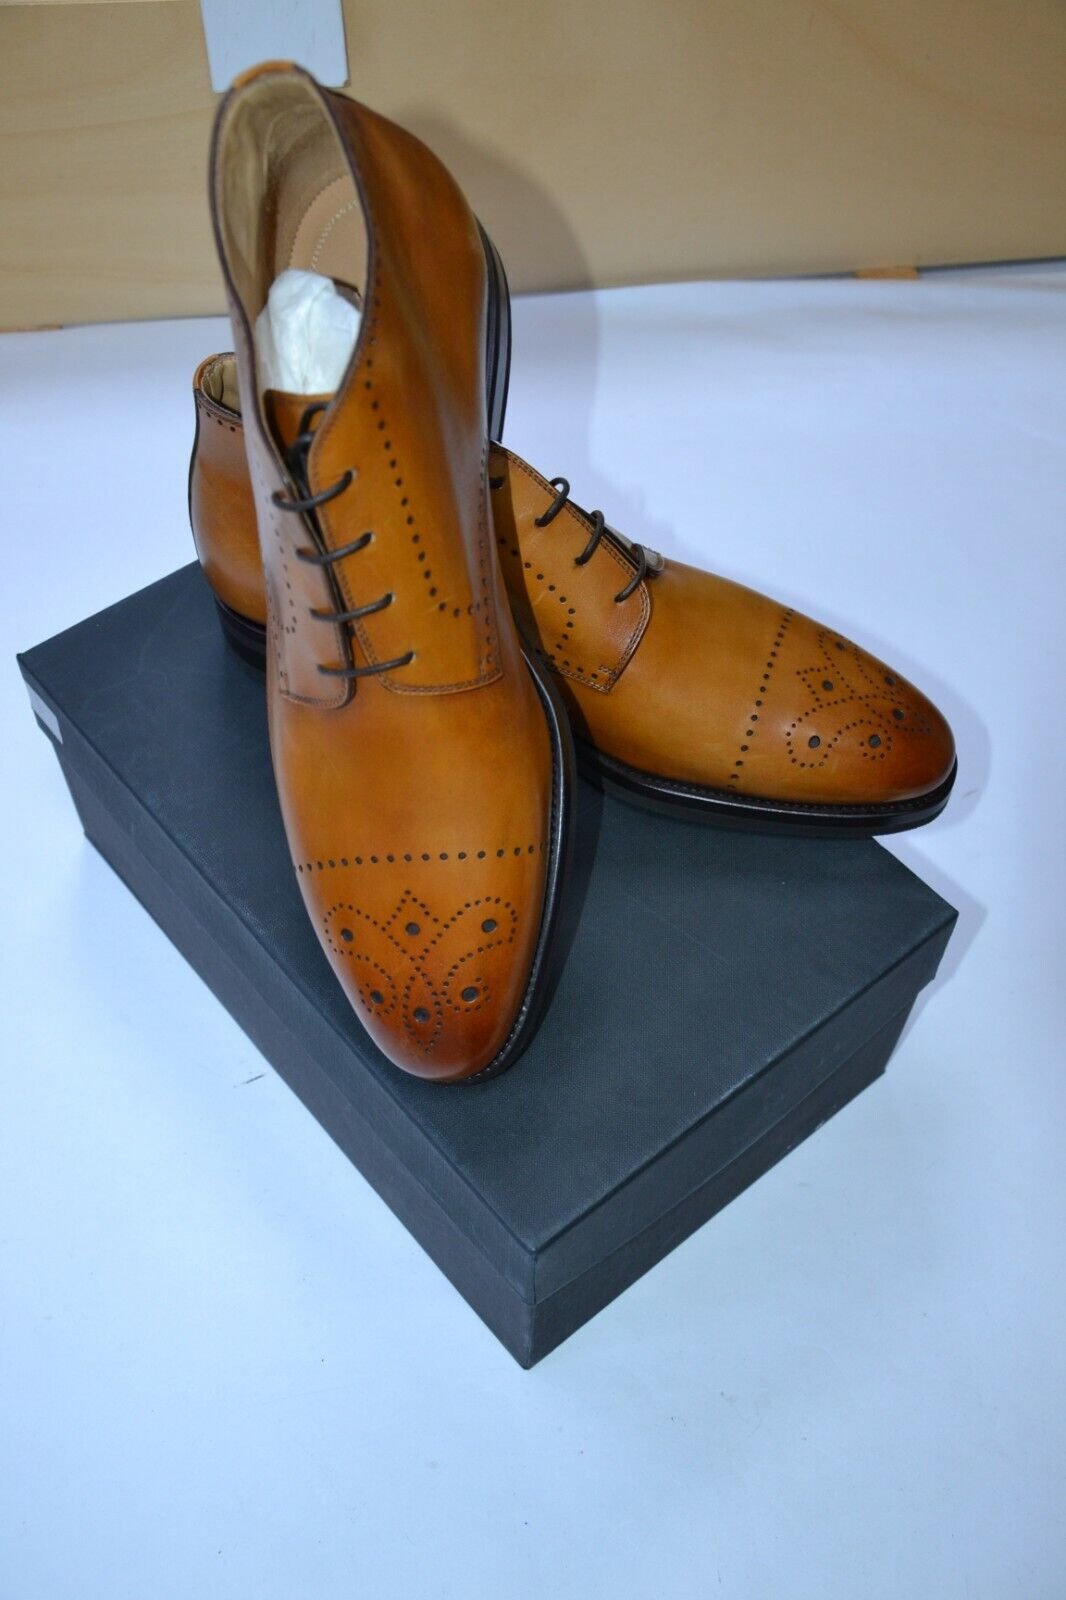 NWB KITON Napoli mens dress leather shoes size EU 42 UK 8 US 9